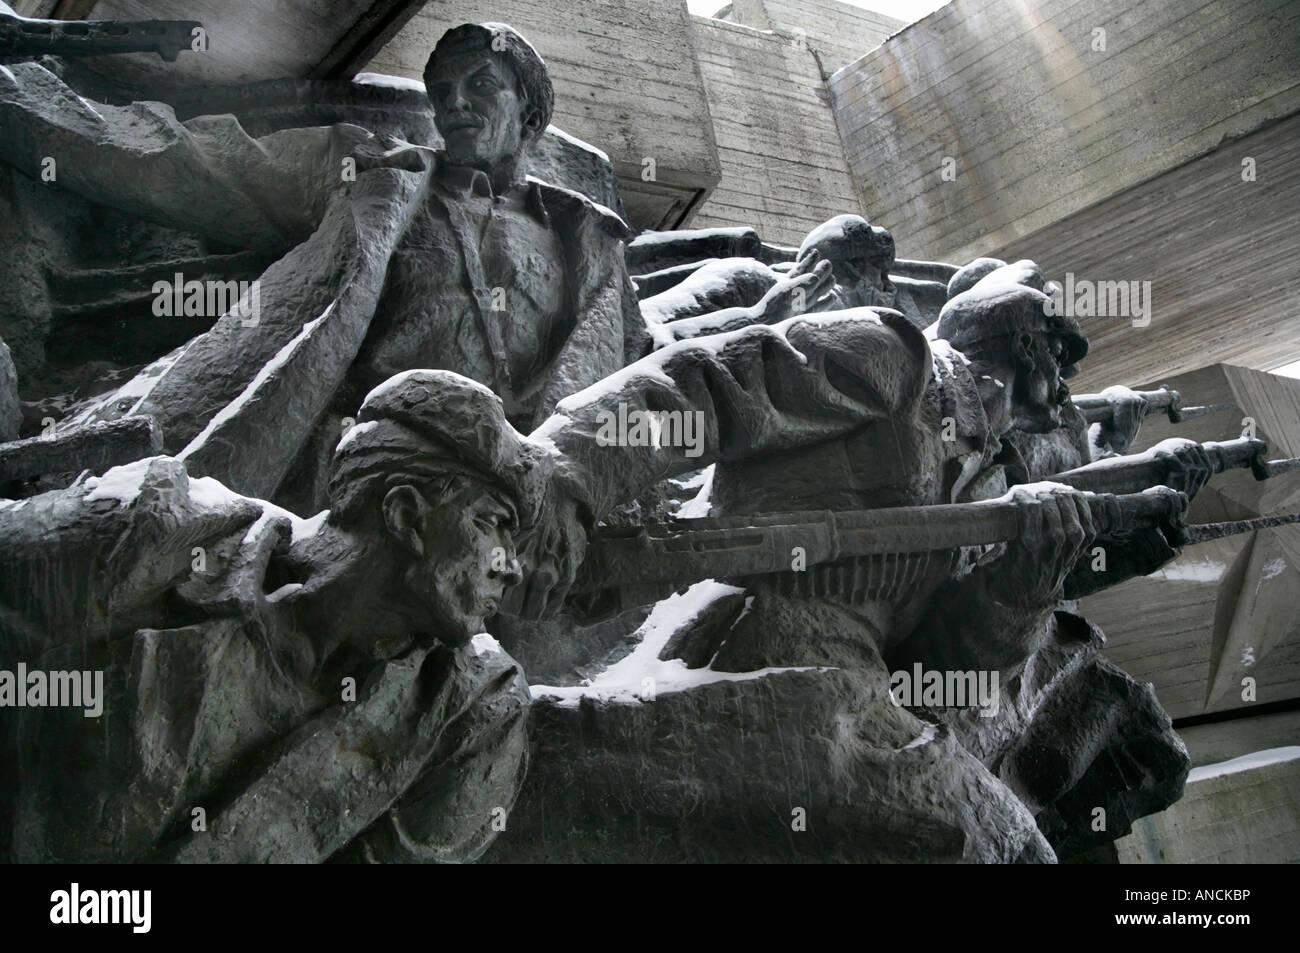 Sculpture depicting resistance to the German invasion of Kiev during the Great Patriotic War (WW2), Kiev, Ukraine. Stock Photo